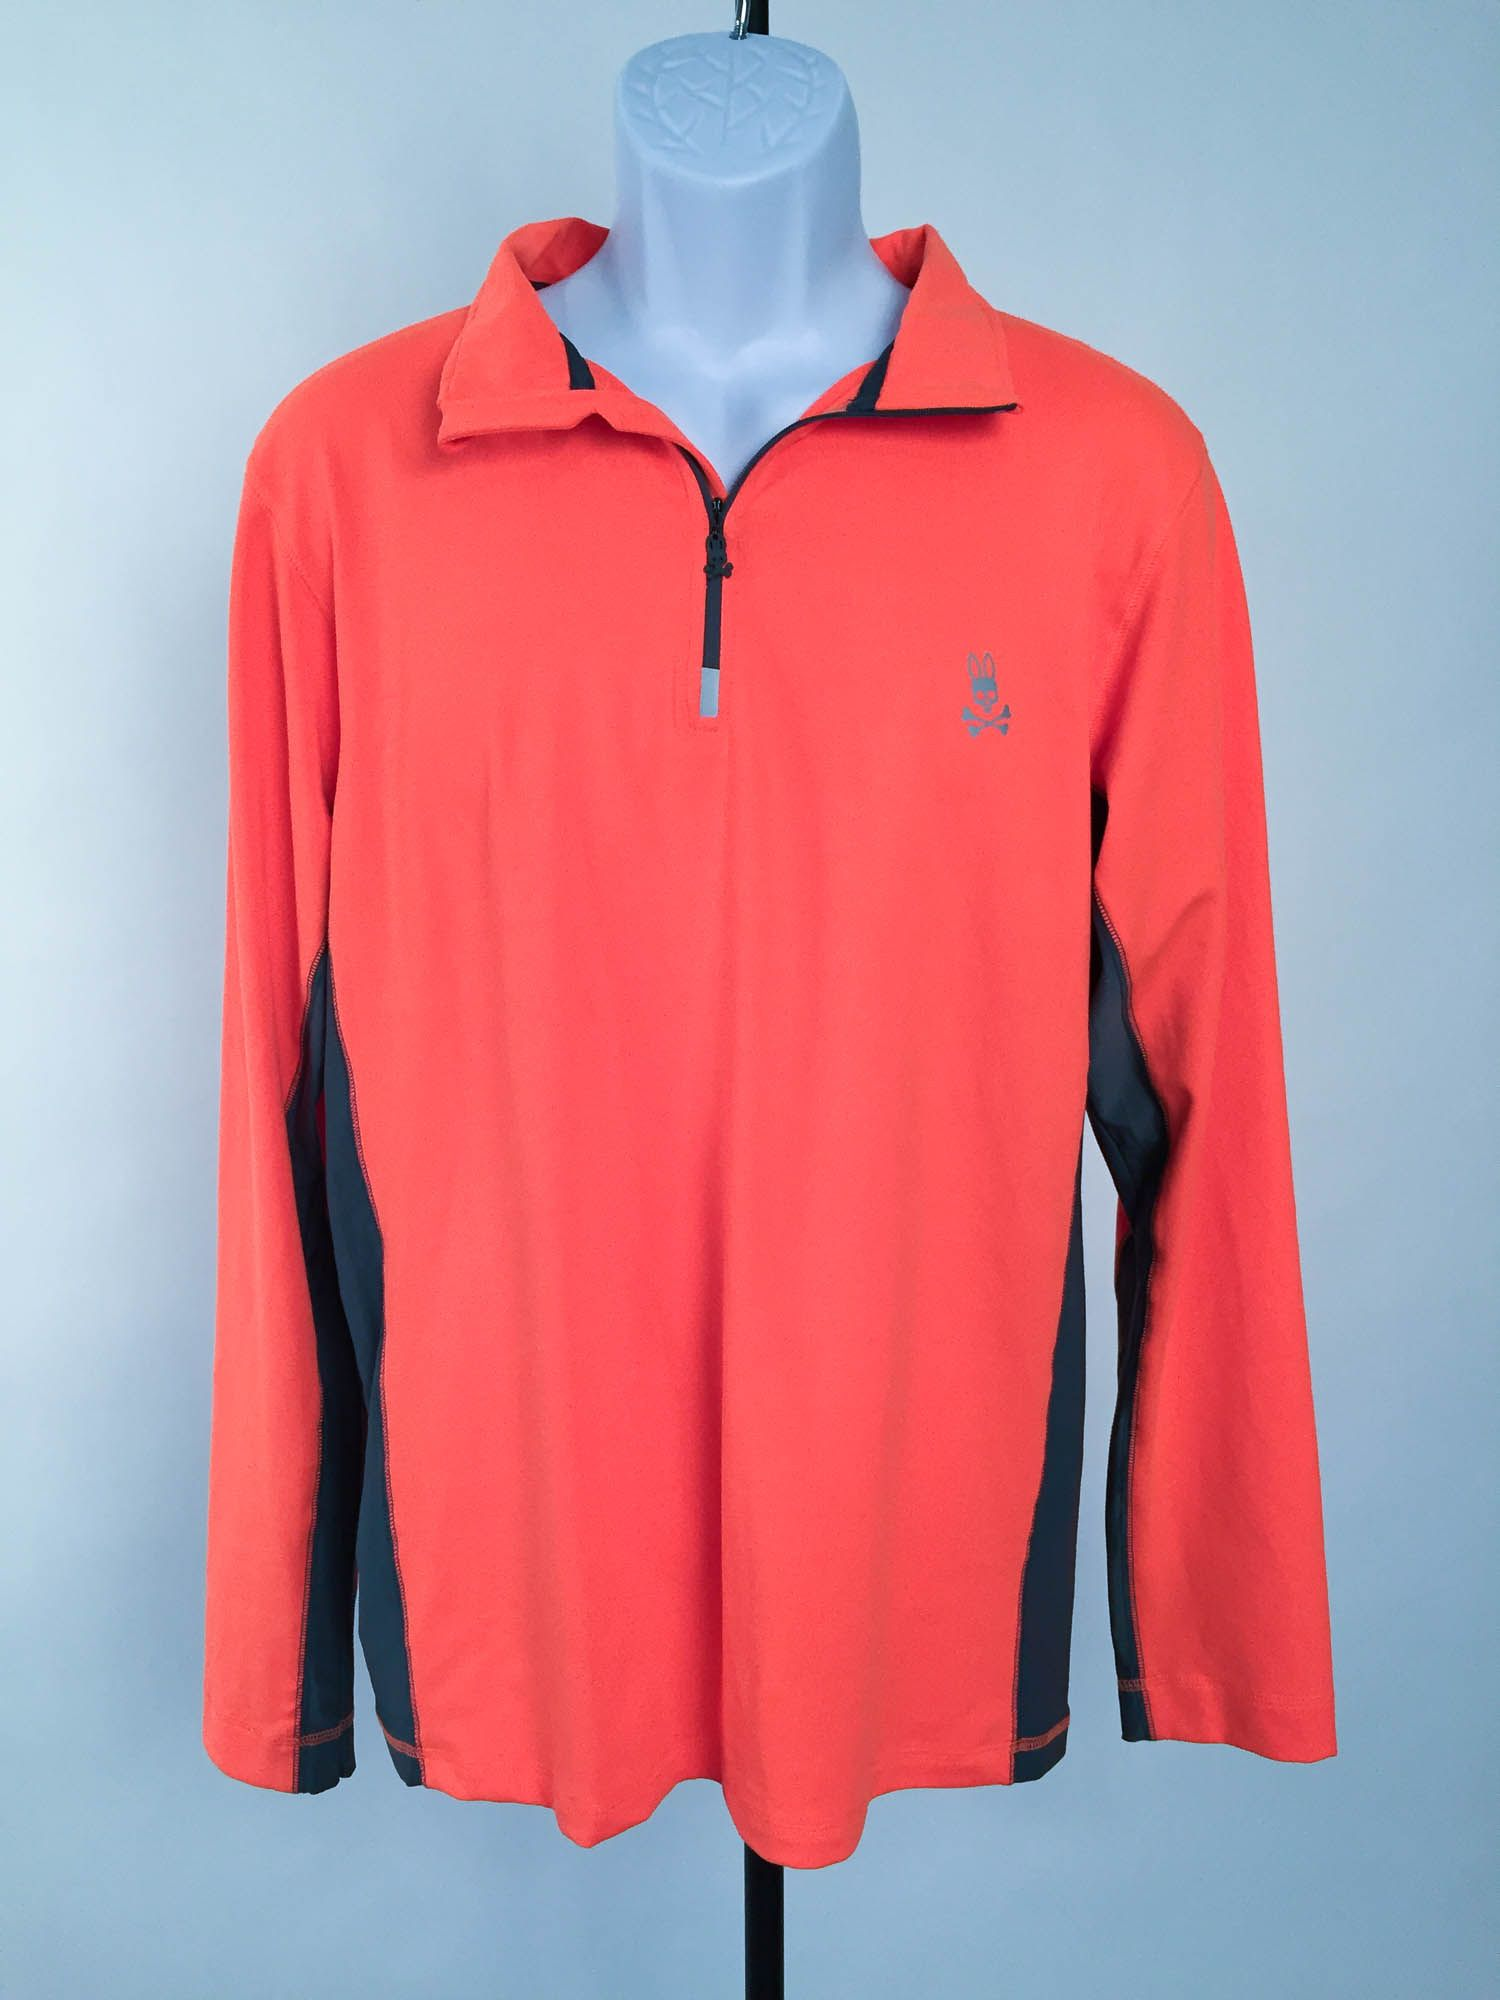 Psycho bunny 12 zip orange and grey running shirt m